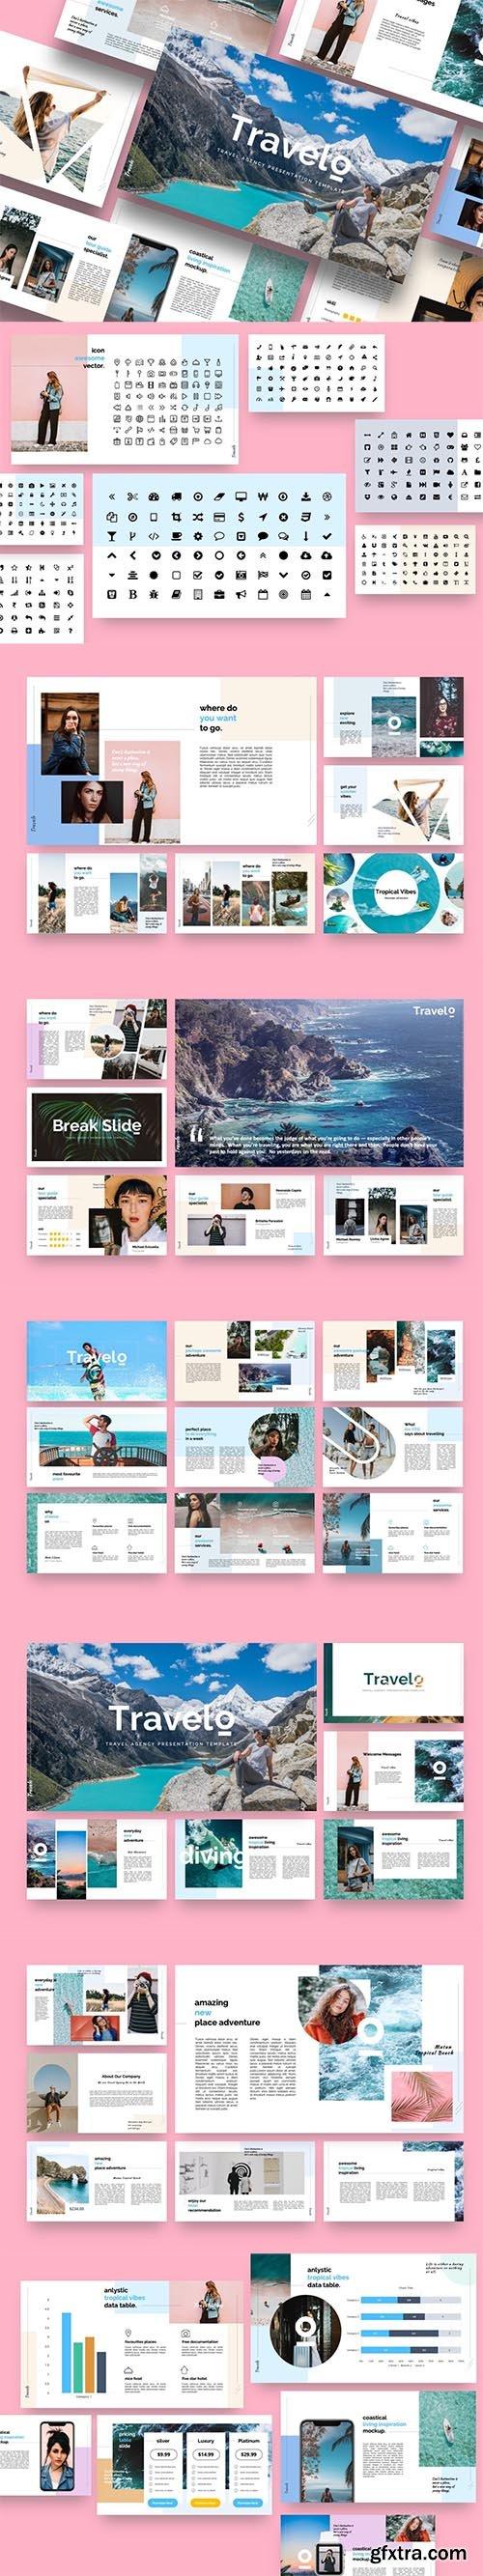 Travelo - Travel Agency Keynote Template